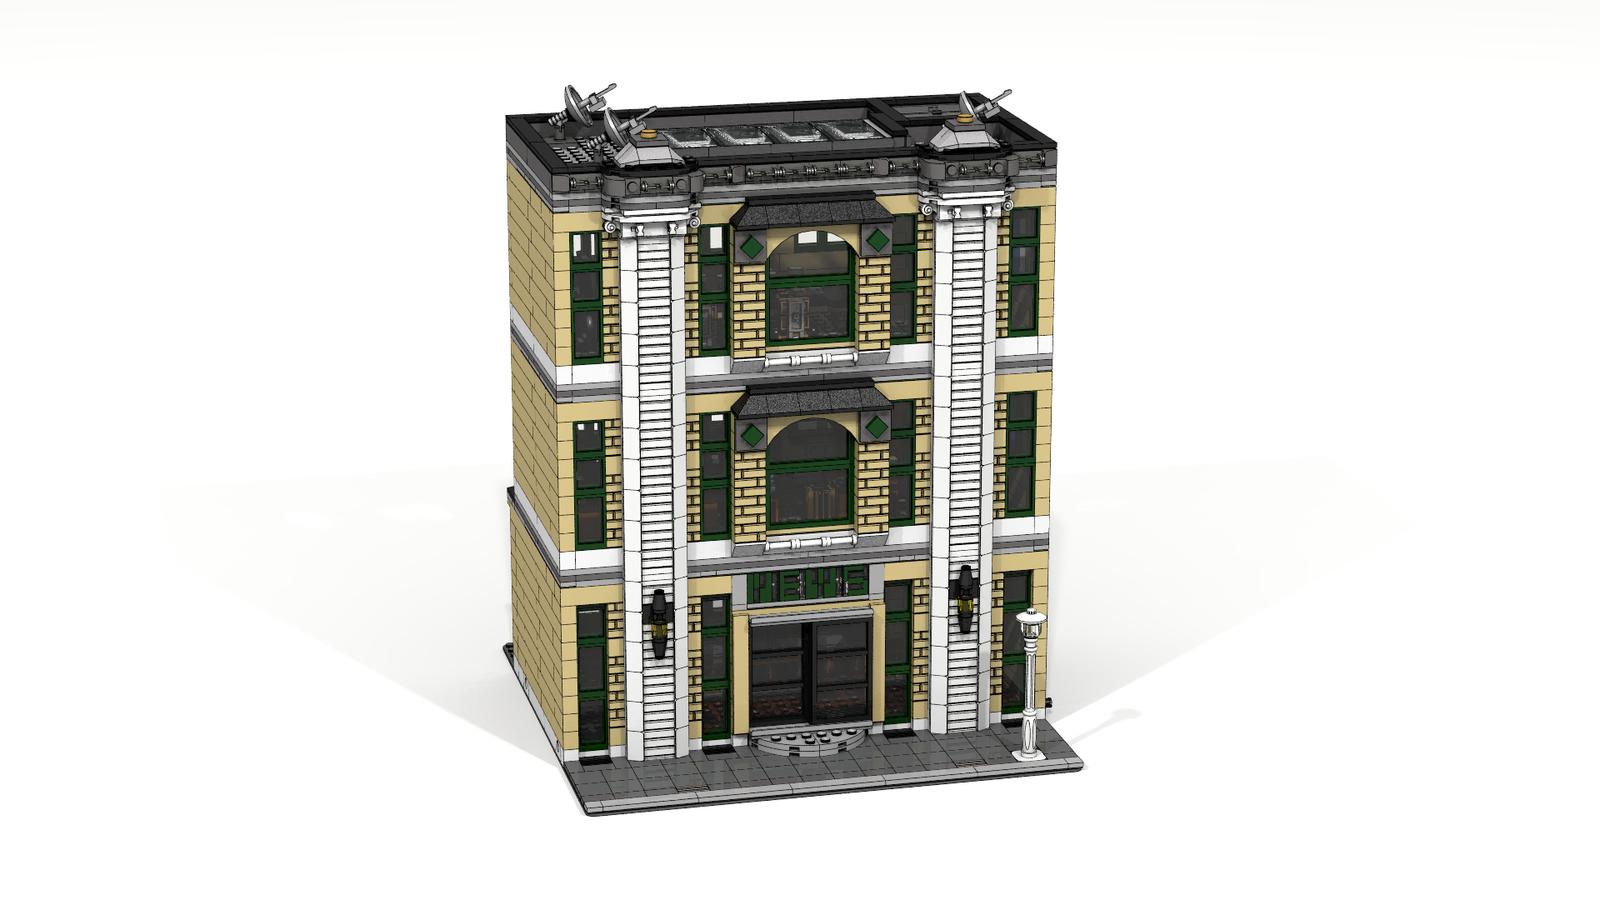 Lego ideas product ideas news bureau